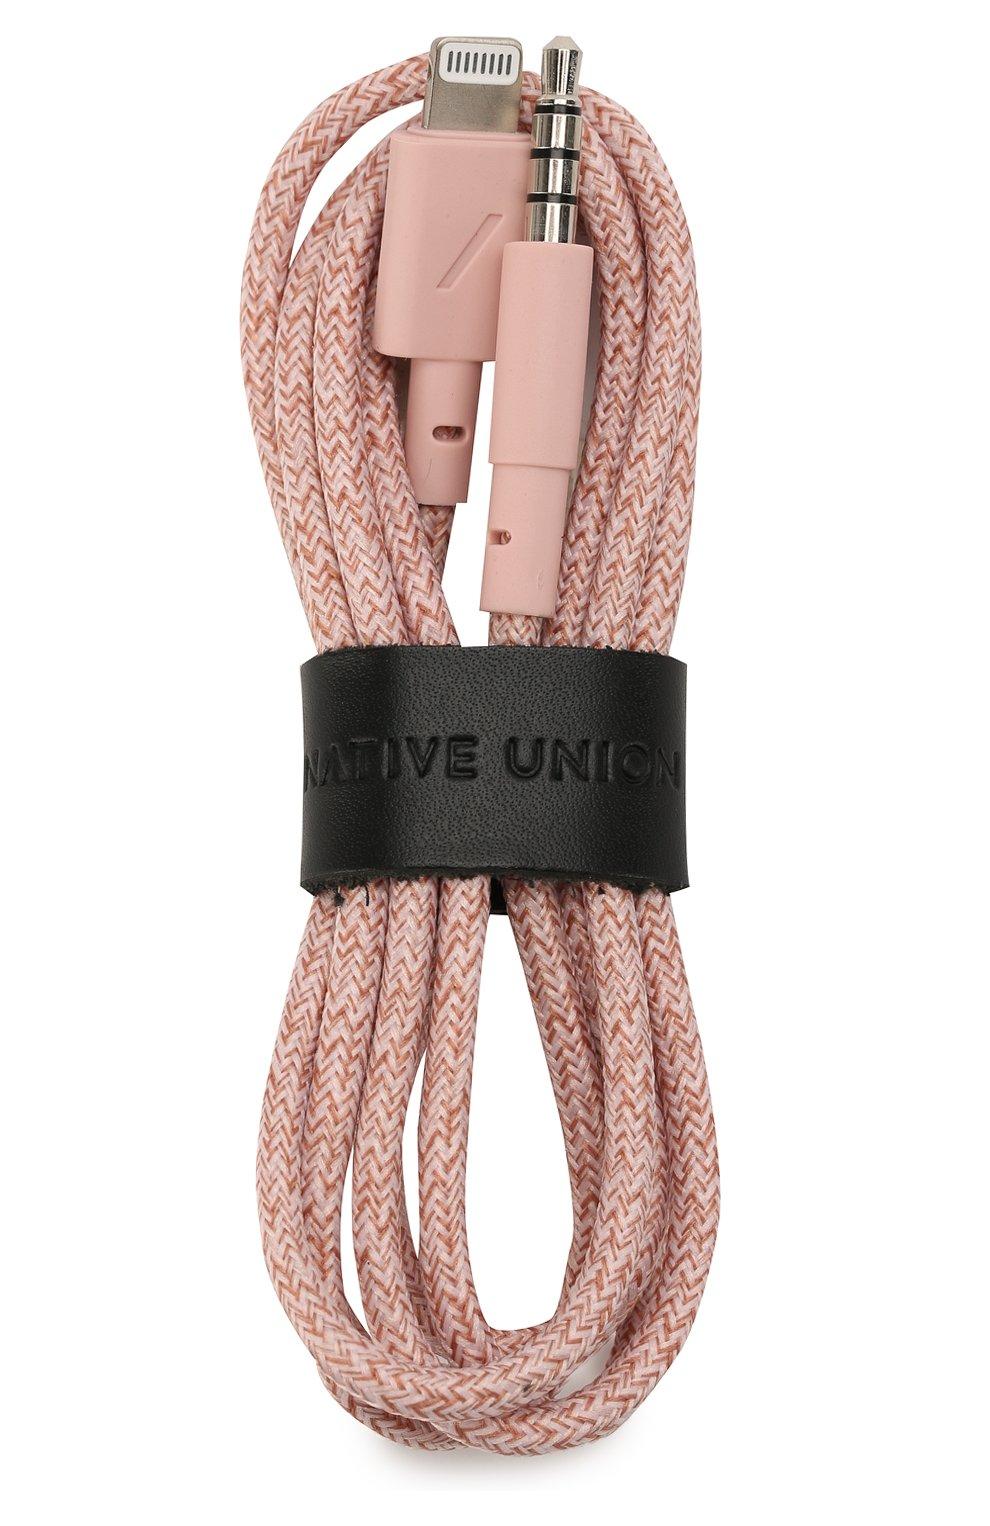 Мужской кабель lightning/3.5mm NATIVE UNION розового цвета, арт. BELT-L-AUX-ROSE   Фото 1